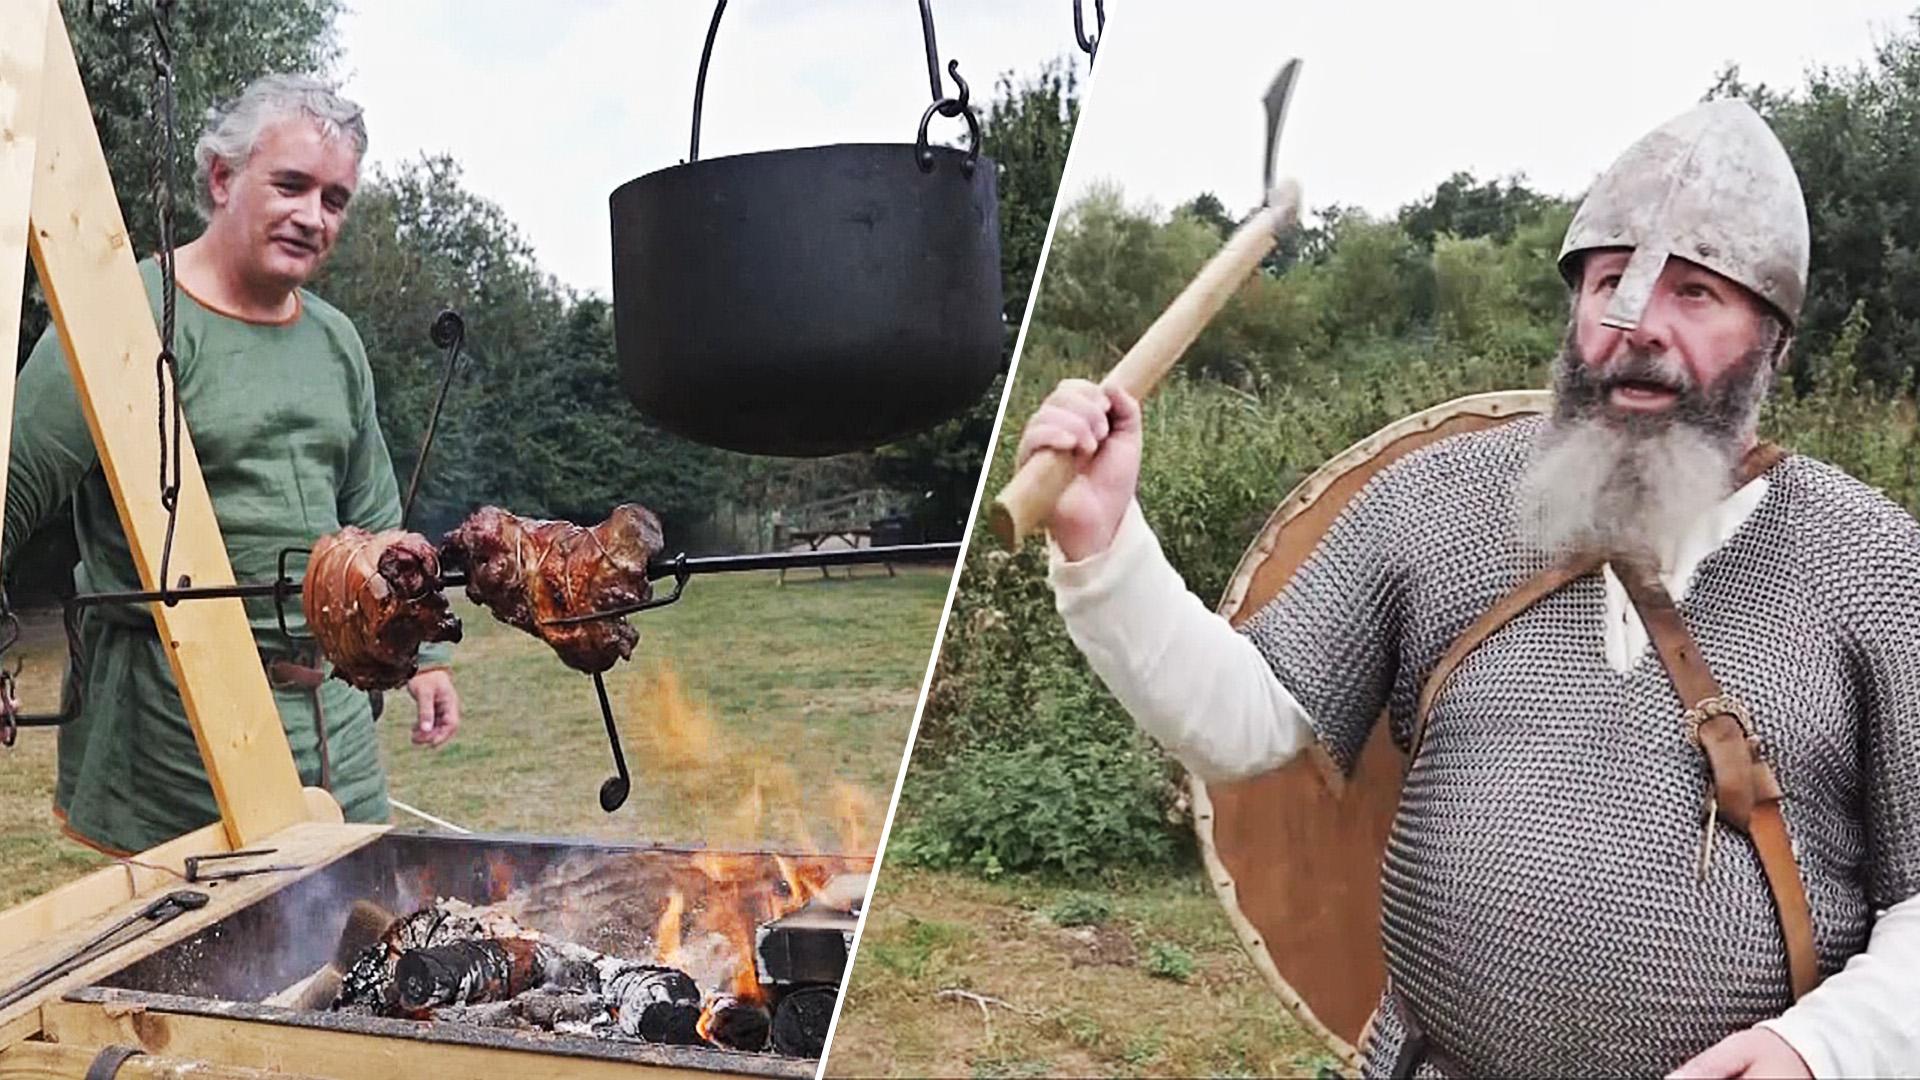 Как жили викинги, показали на фестивале в Англии